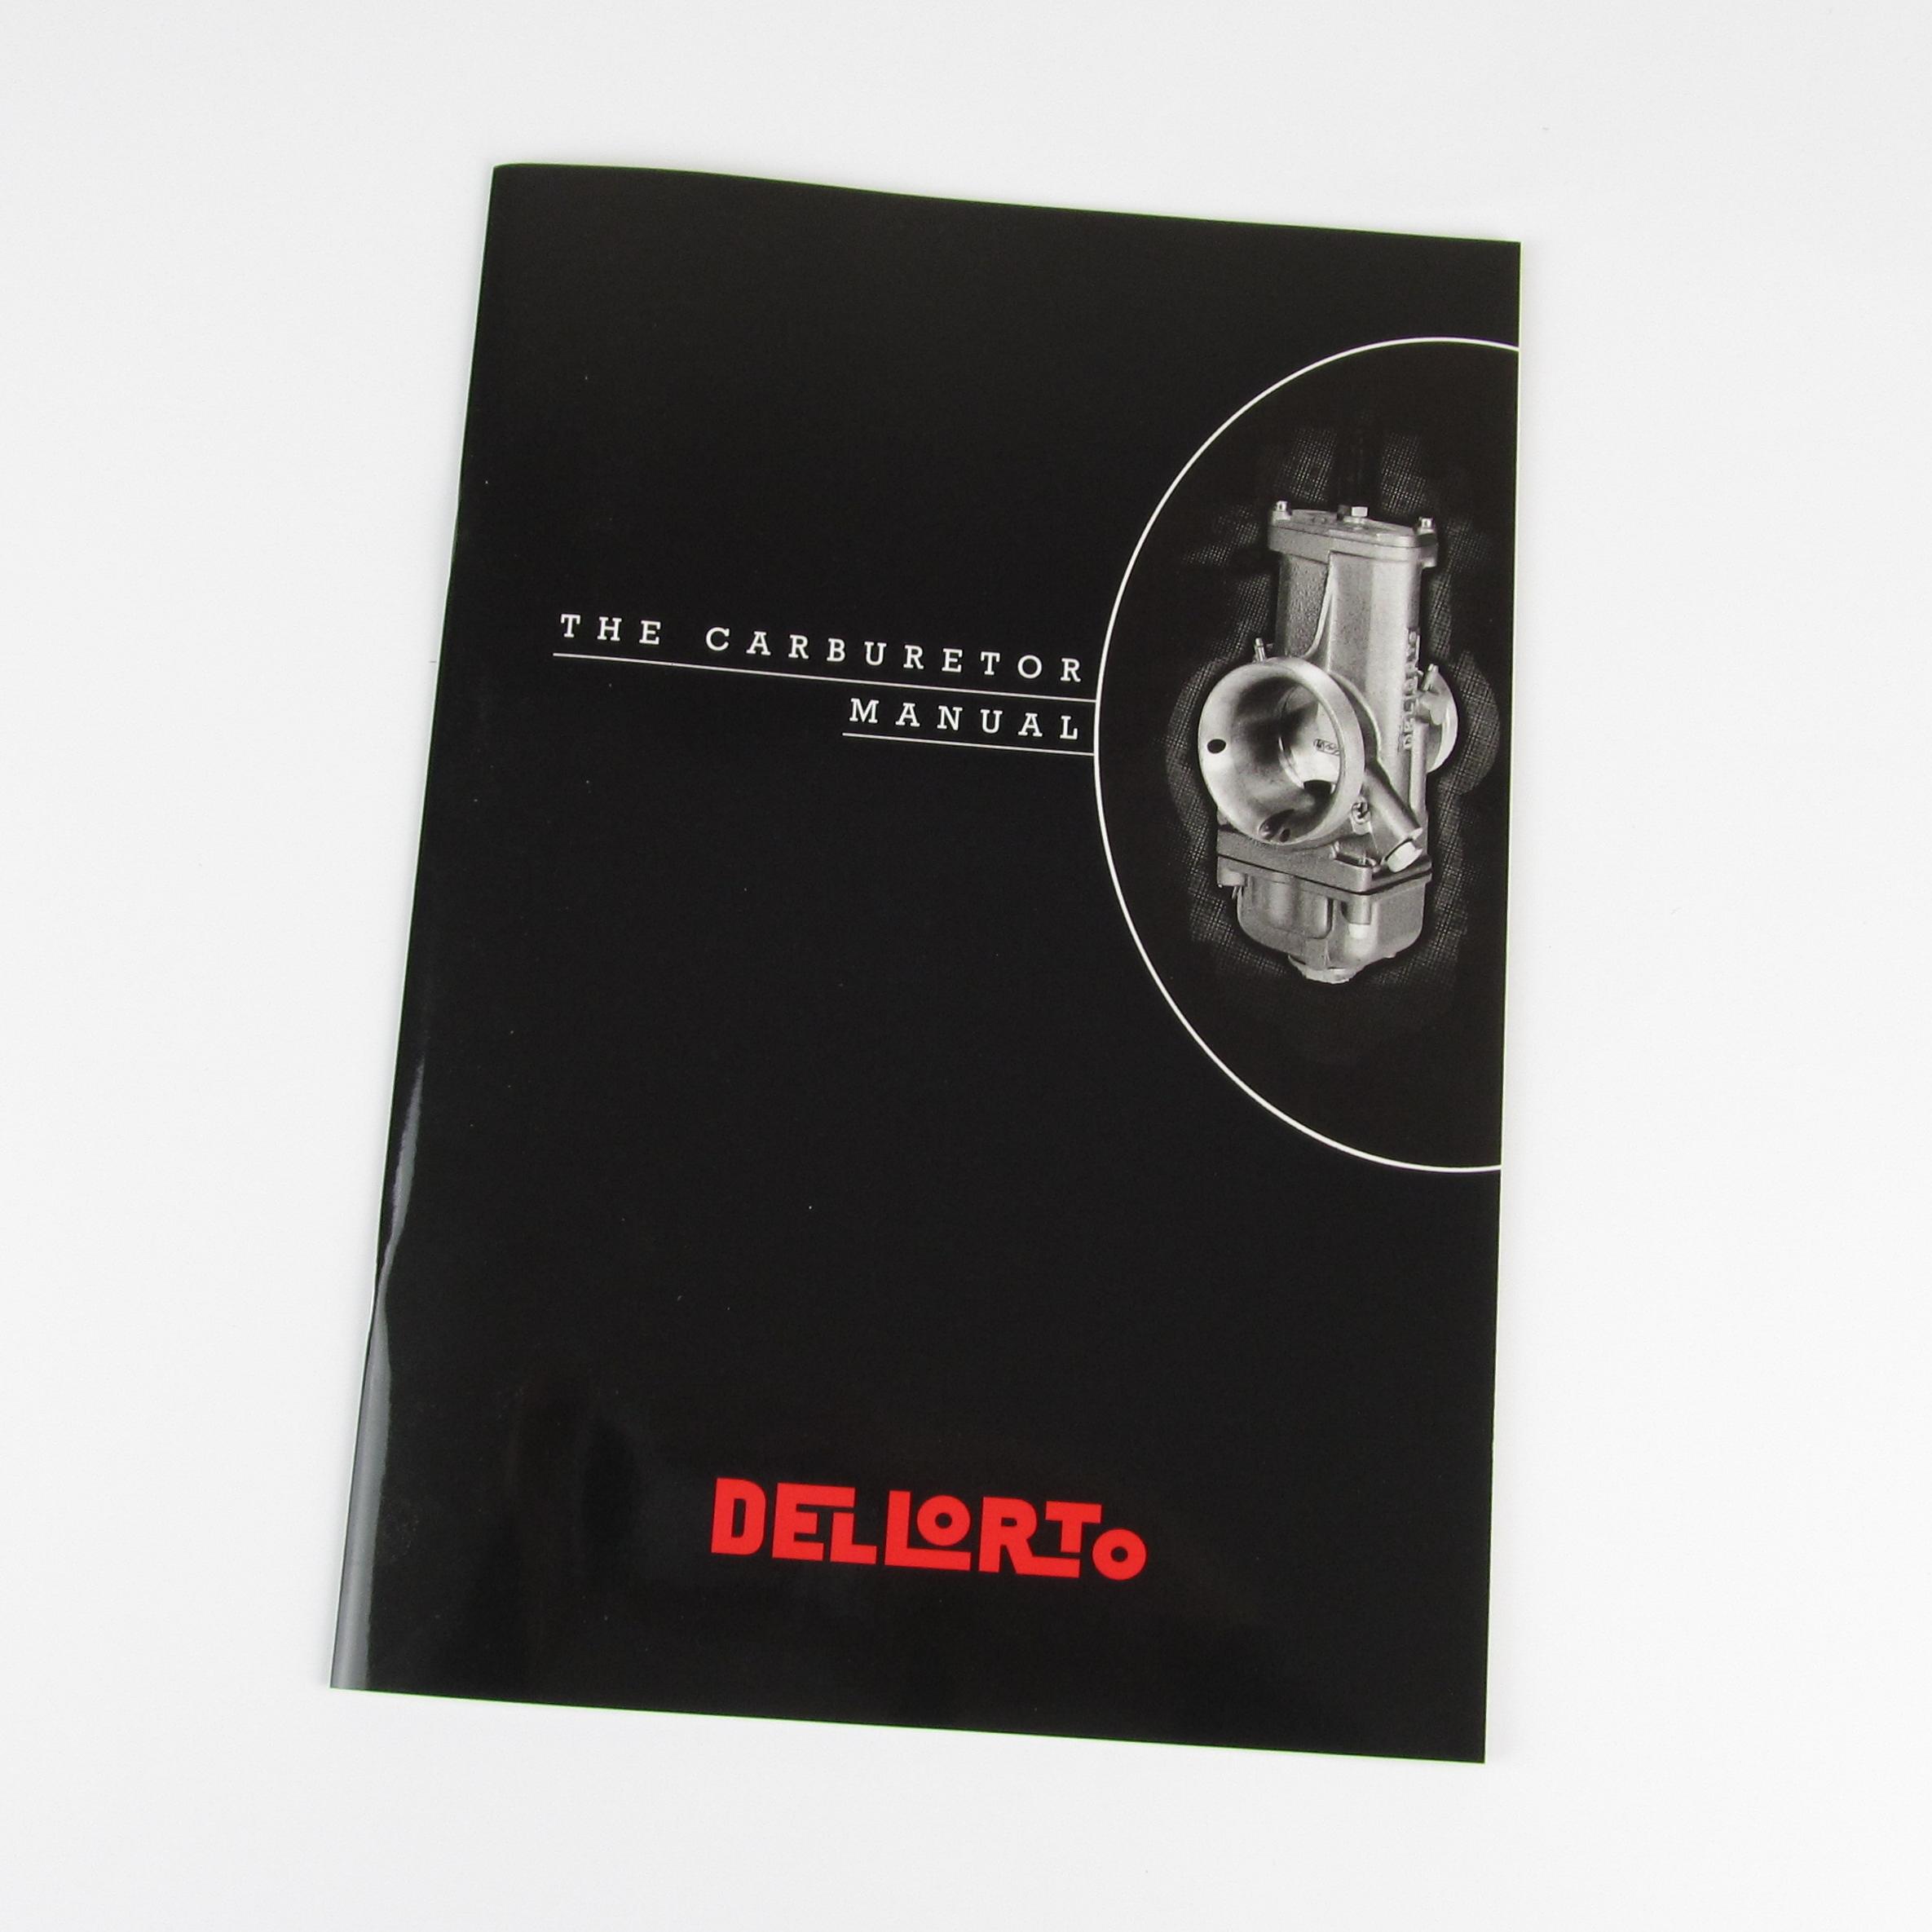 Throttle Position Sensor Principle: Dellorto Motorcycle Tuning Manual